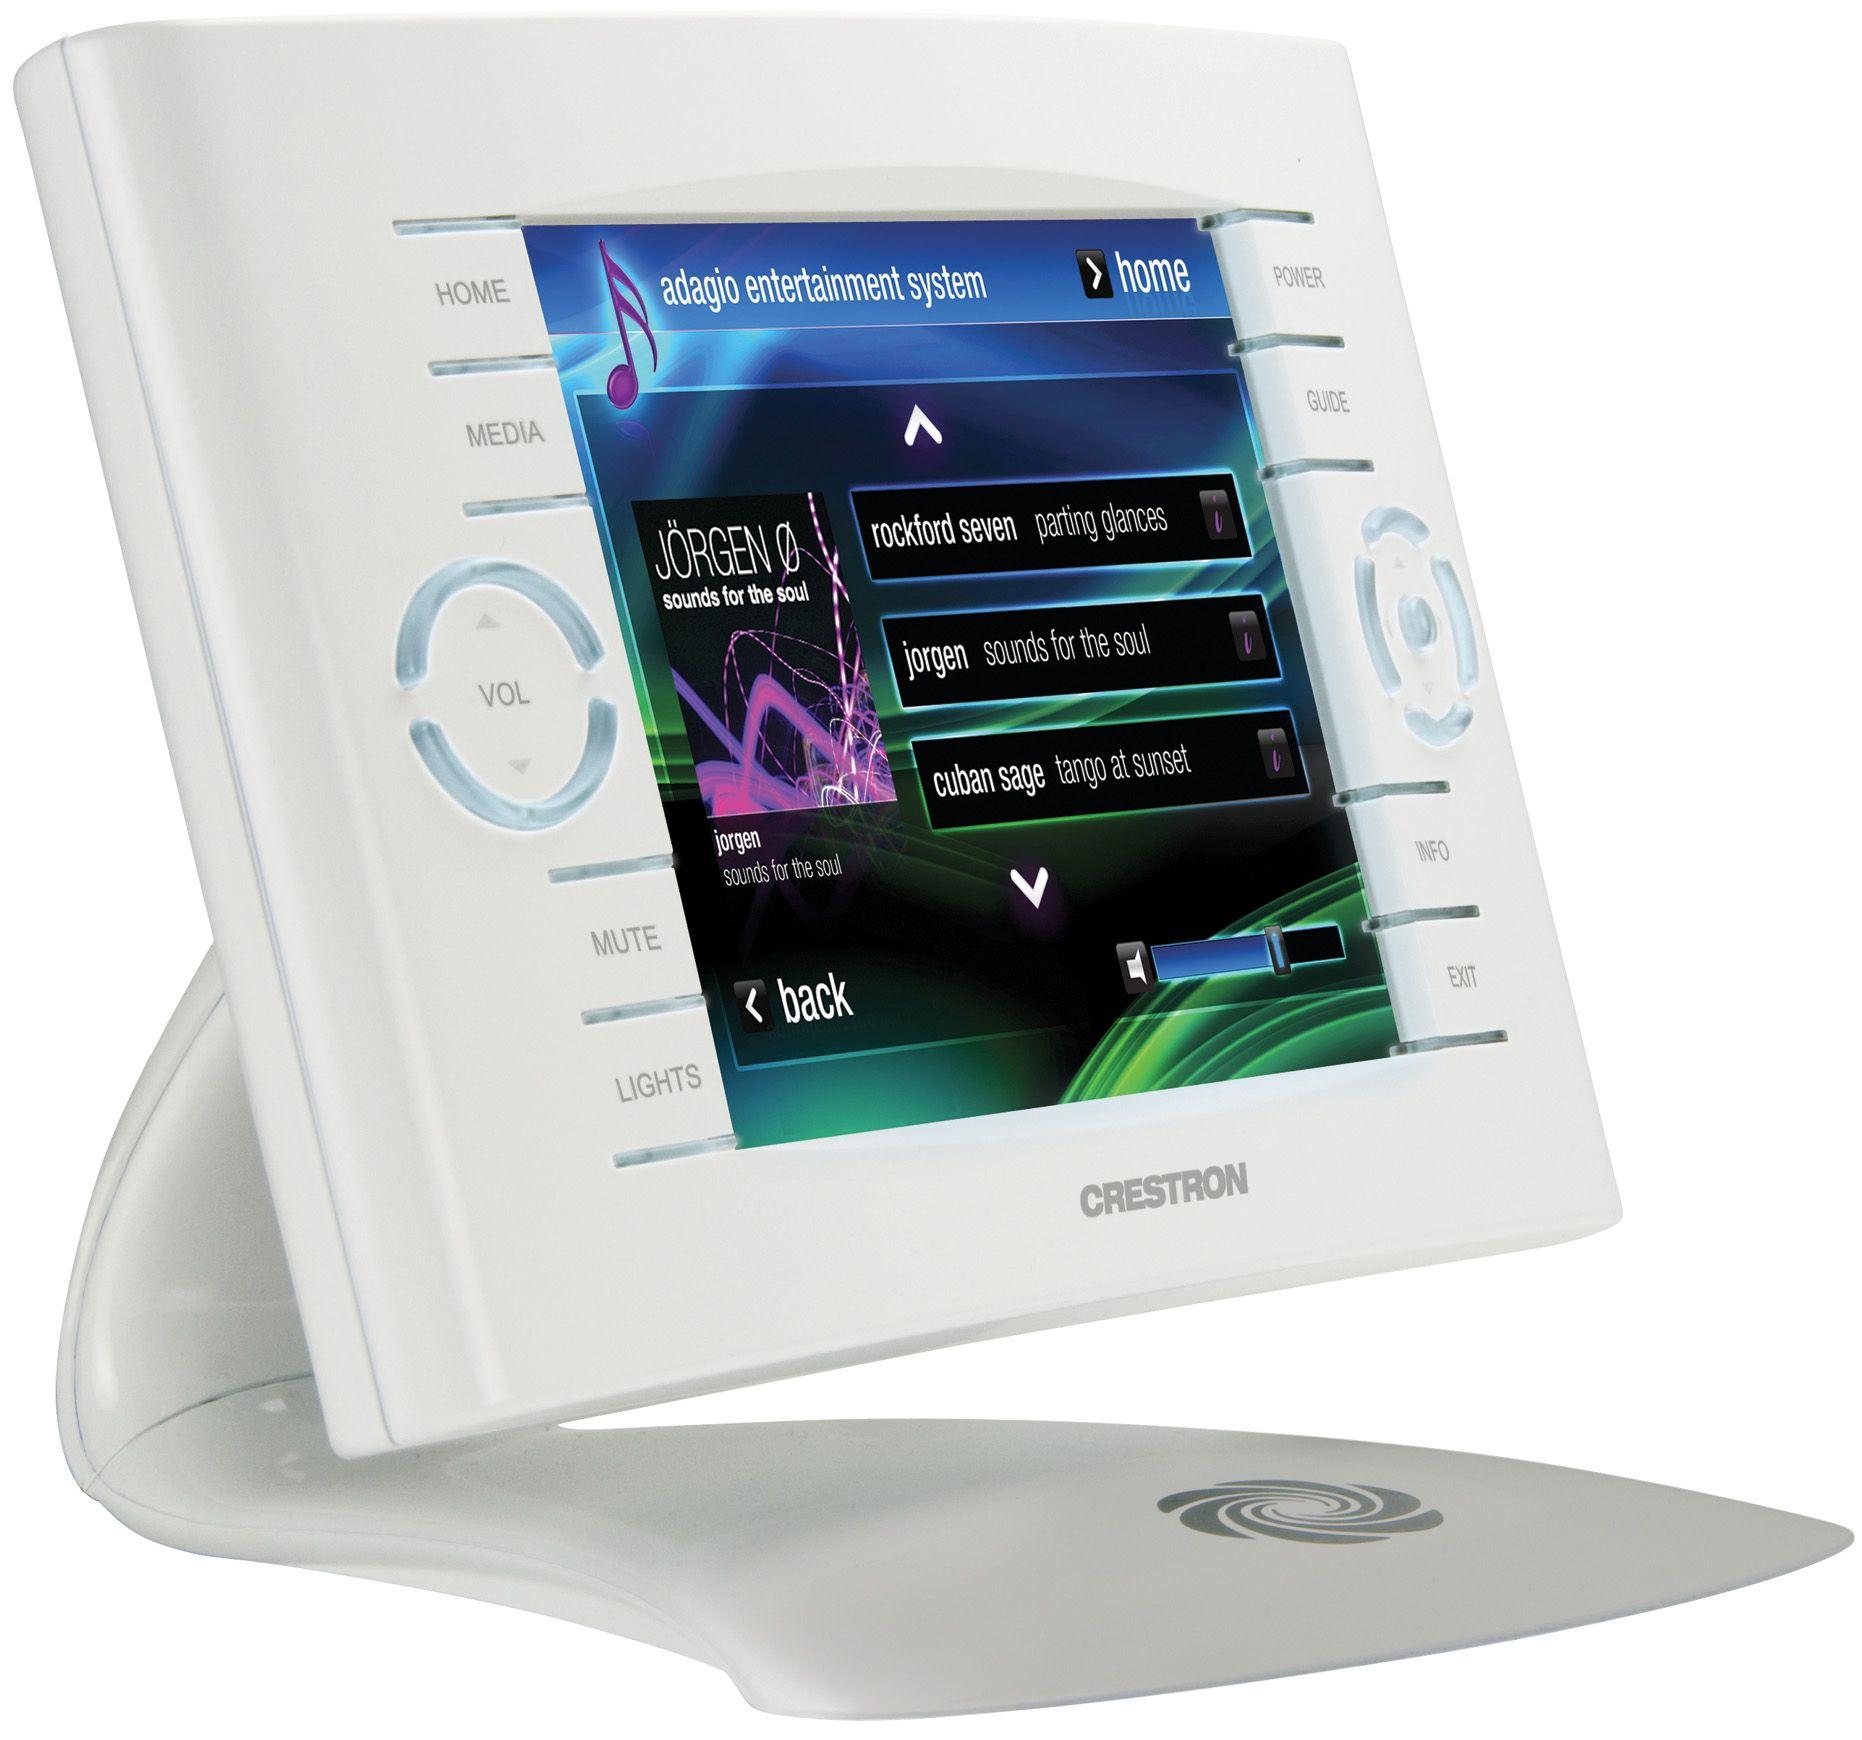 Crestron Automation Touchscreen Controller Tps 6x Home Automation System Home Automation Touch Panel